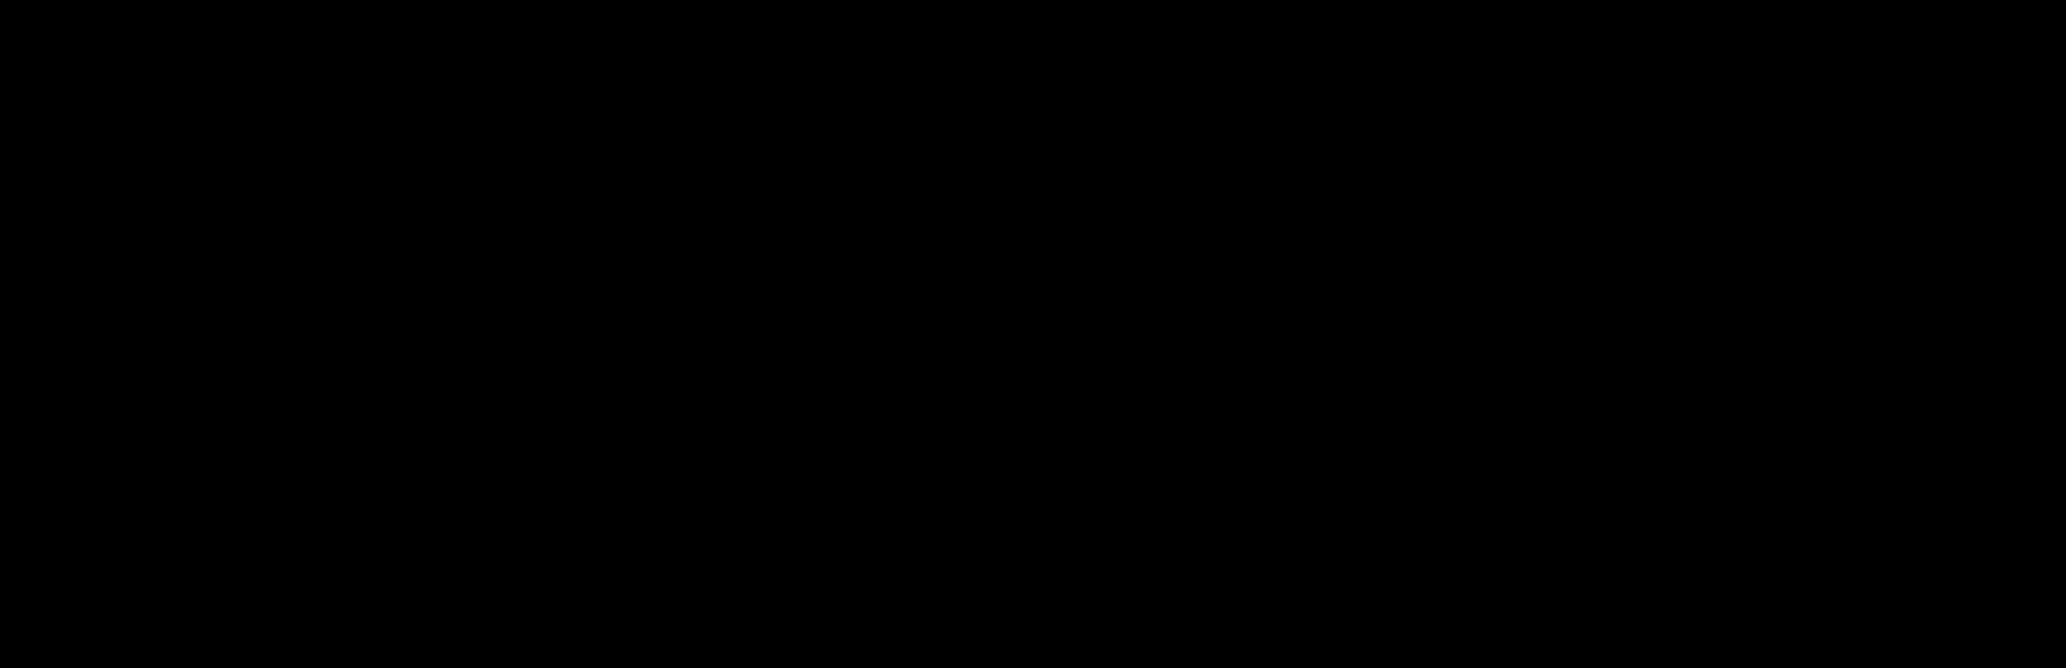 Suberoylanilide-d<sub>5</sub> hydroxamic acid (d<sub>5</sub>-SAHA)